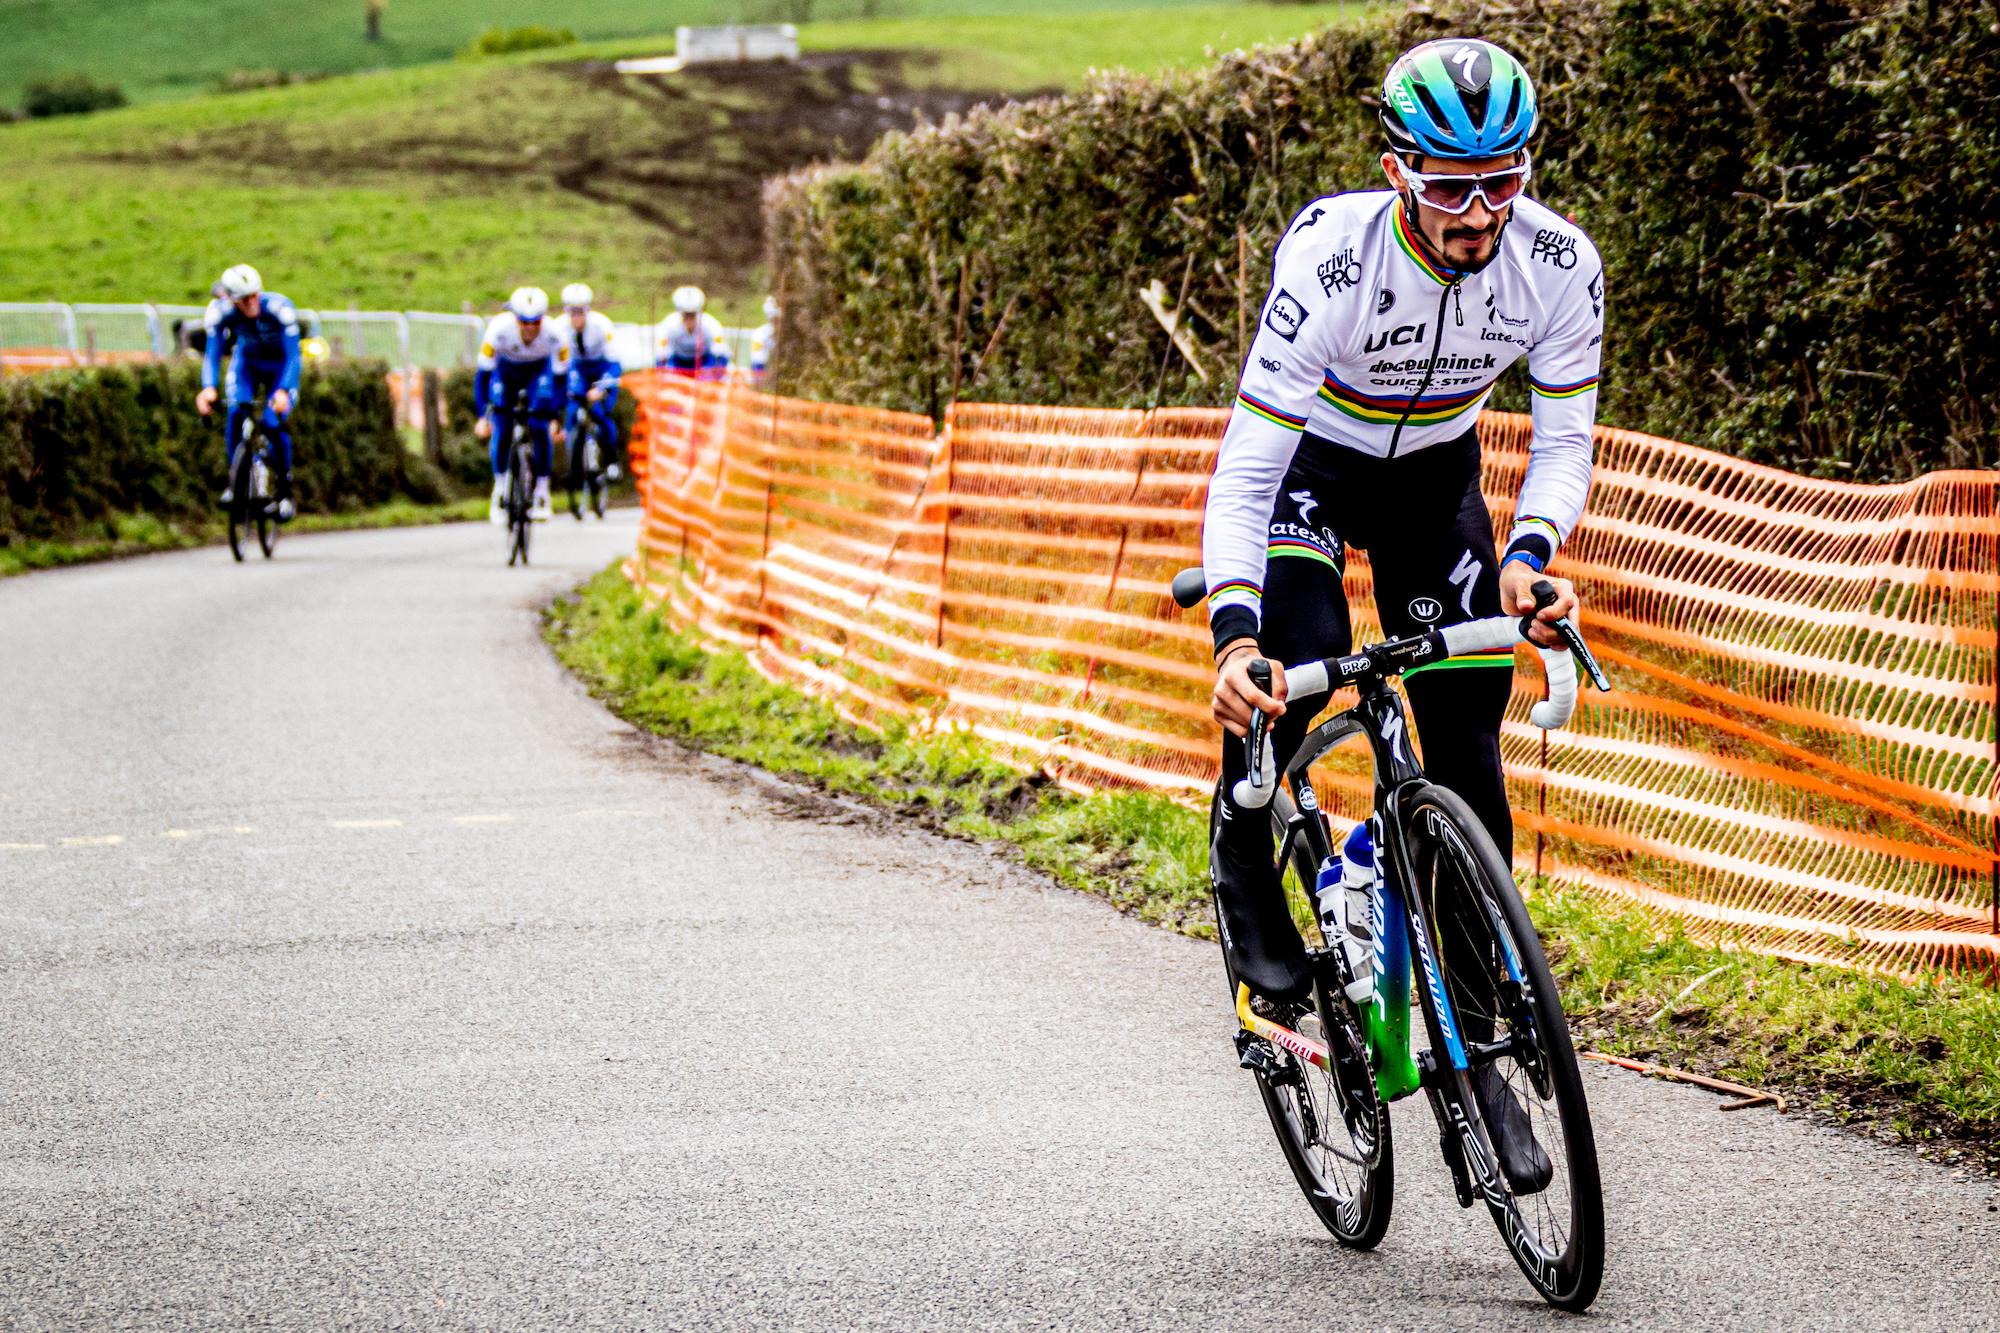 Julian Alaphilippe unveils rainbow jersey and custom Specialized Tarmac SL7 ahead of Liège-Bastogne-Liège 2020 - Cycling Weekly